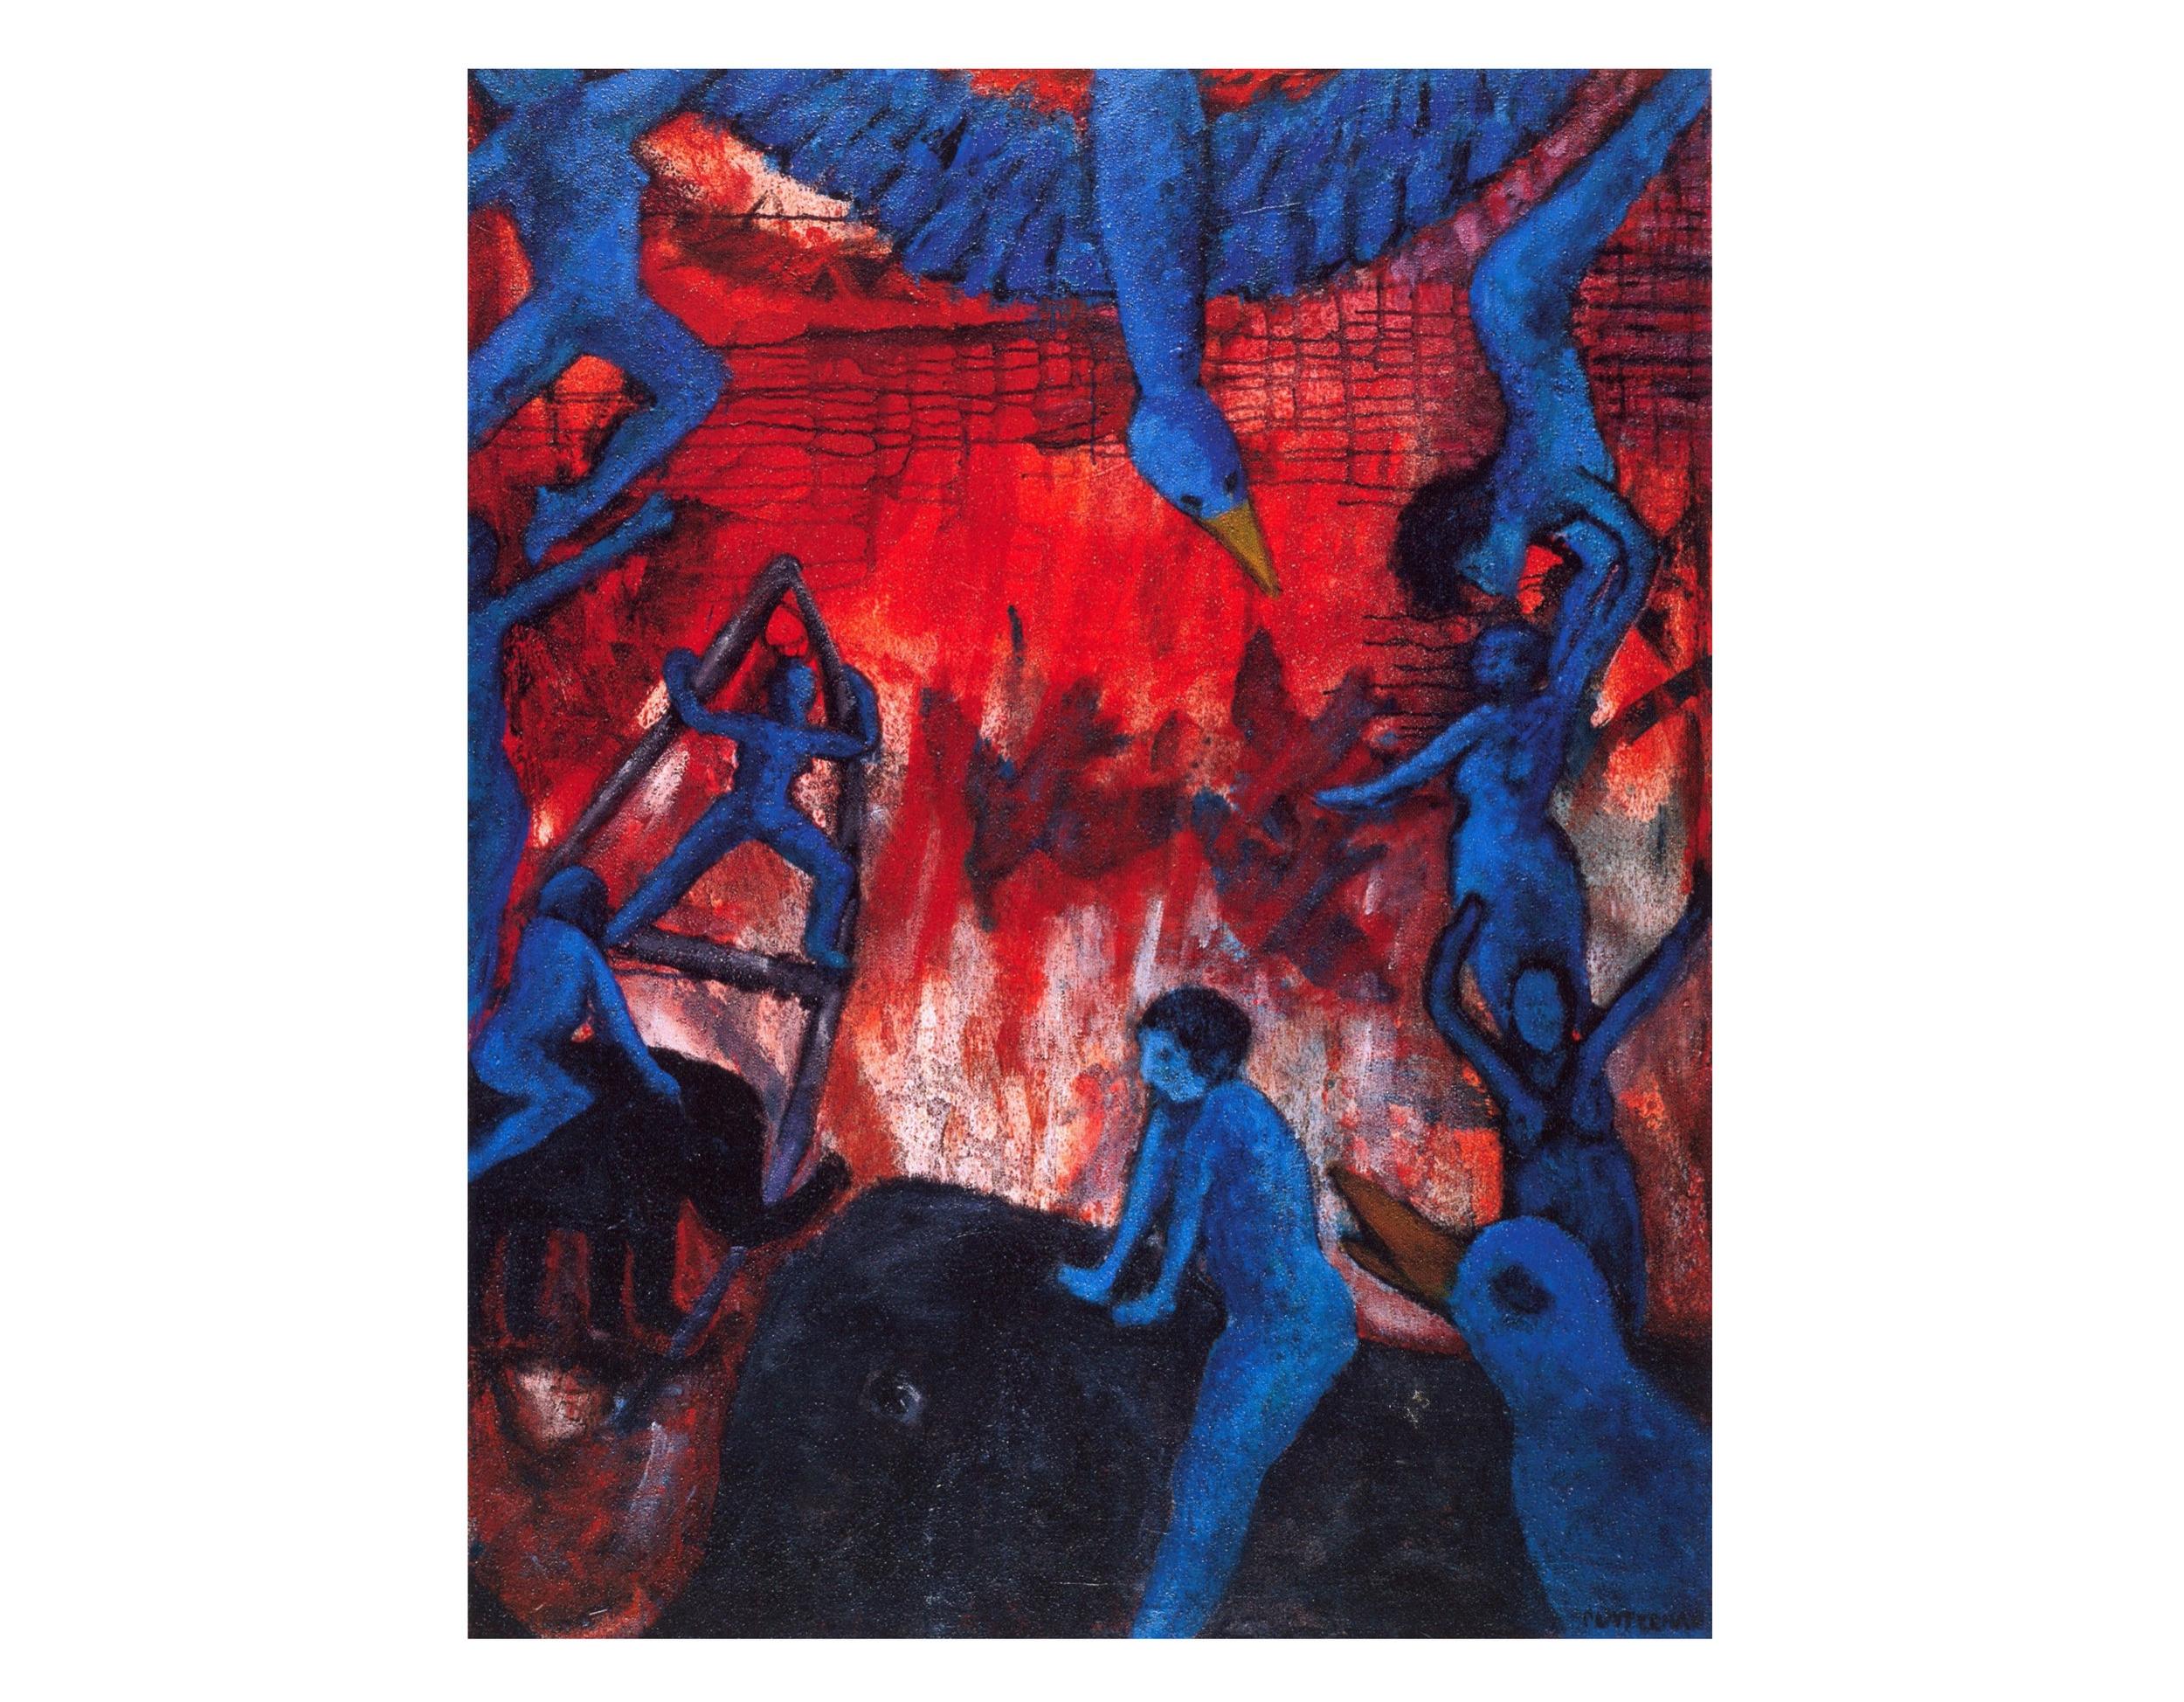 Blue Ladies & Elephants   Acrylic, sand on canvas, 68'' x 72'', 2003